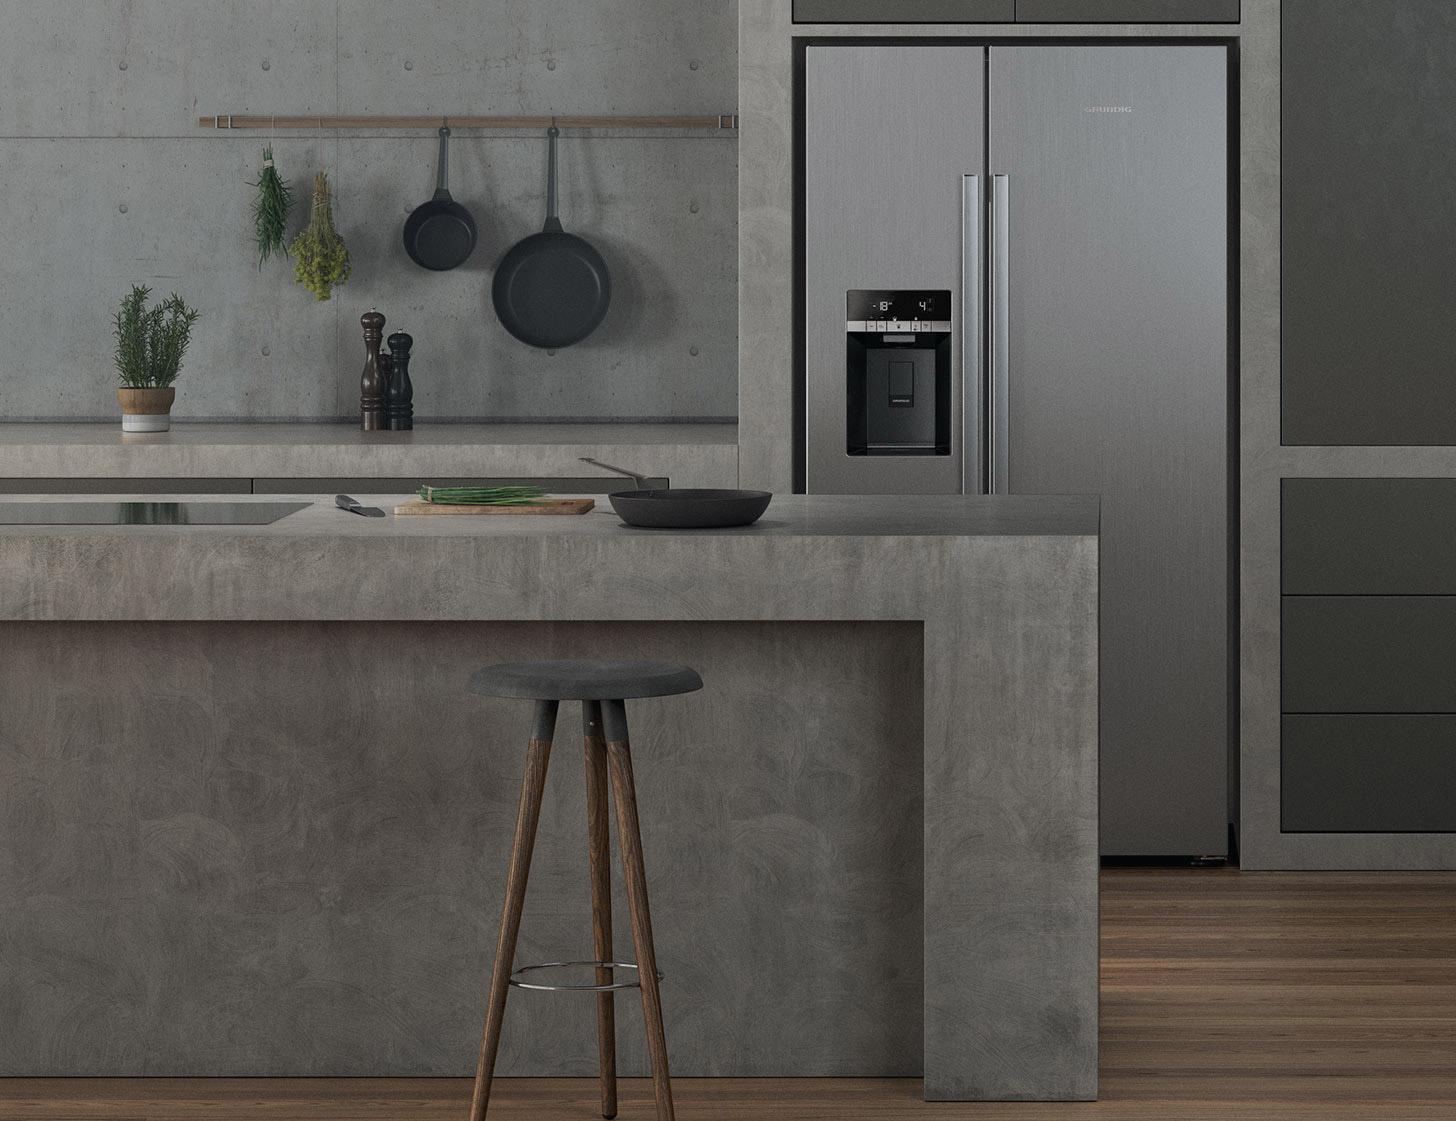 Grundig Kühlschrank Side By Side : Grundig u fullfresh kühlschrank